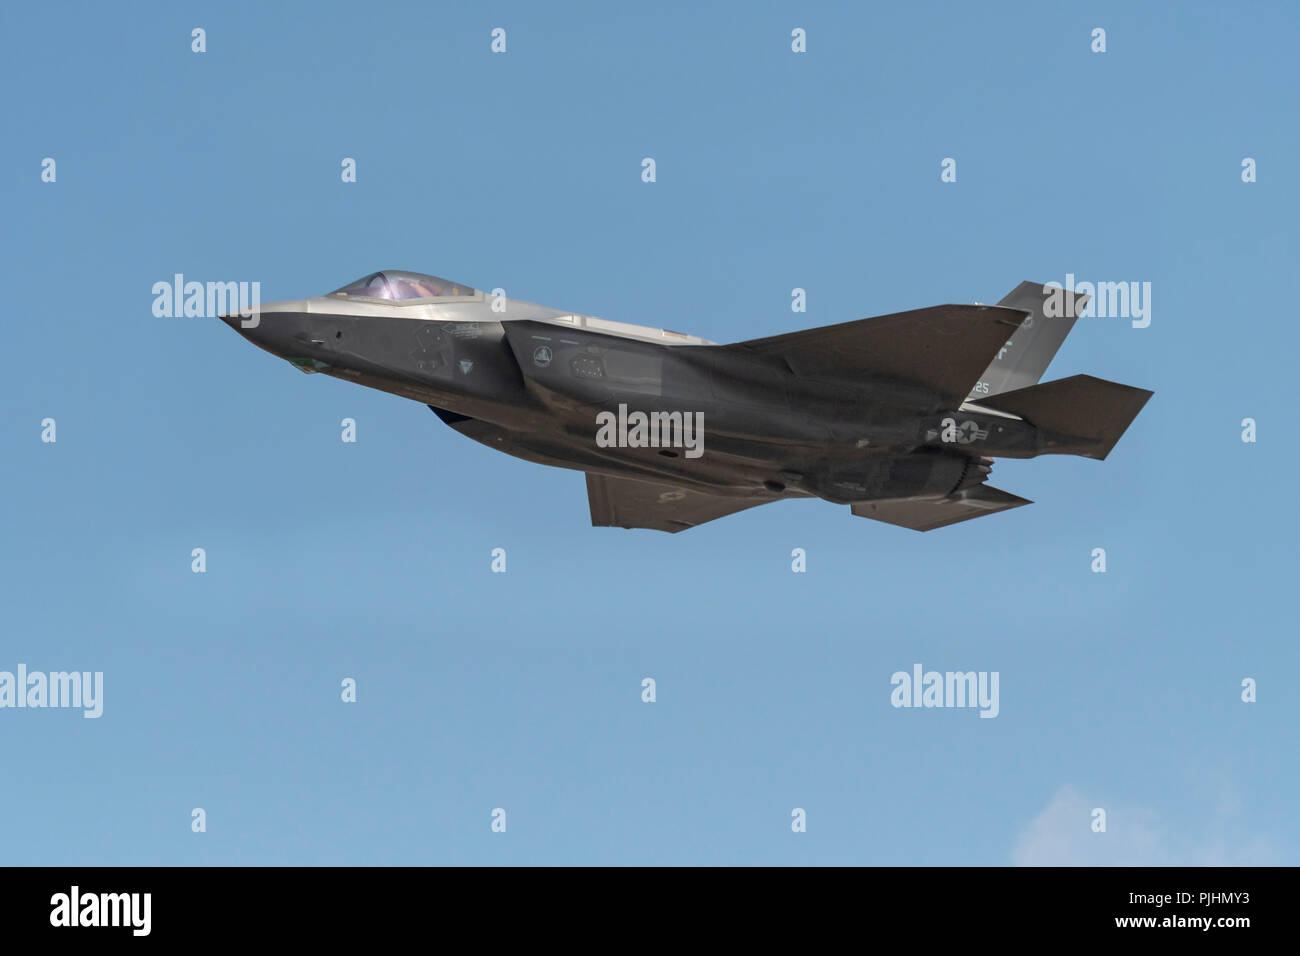 USAF F-35 Lightning, RIAT, RAF Fairford, UK - Stock Image